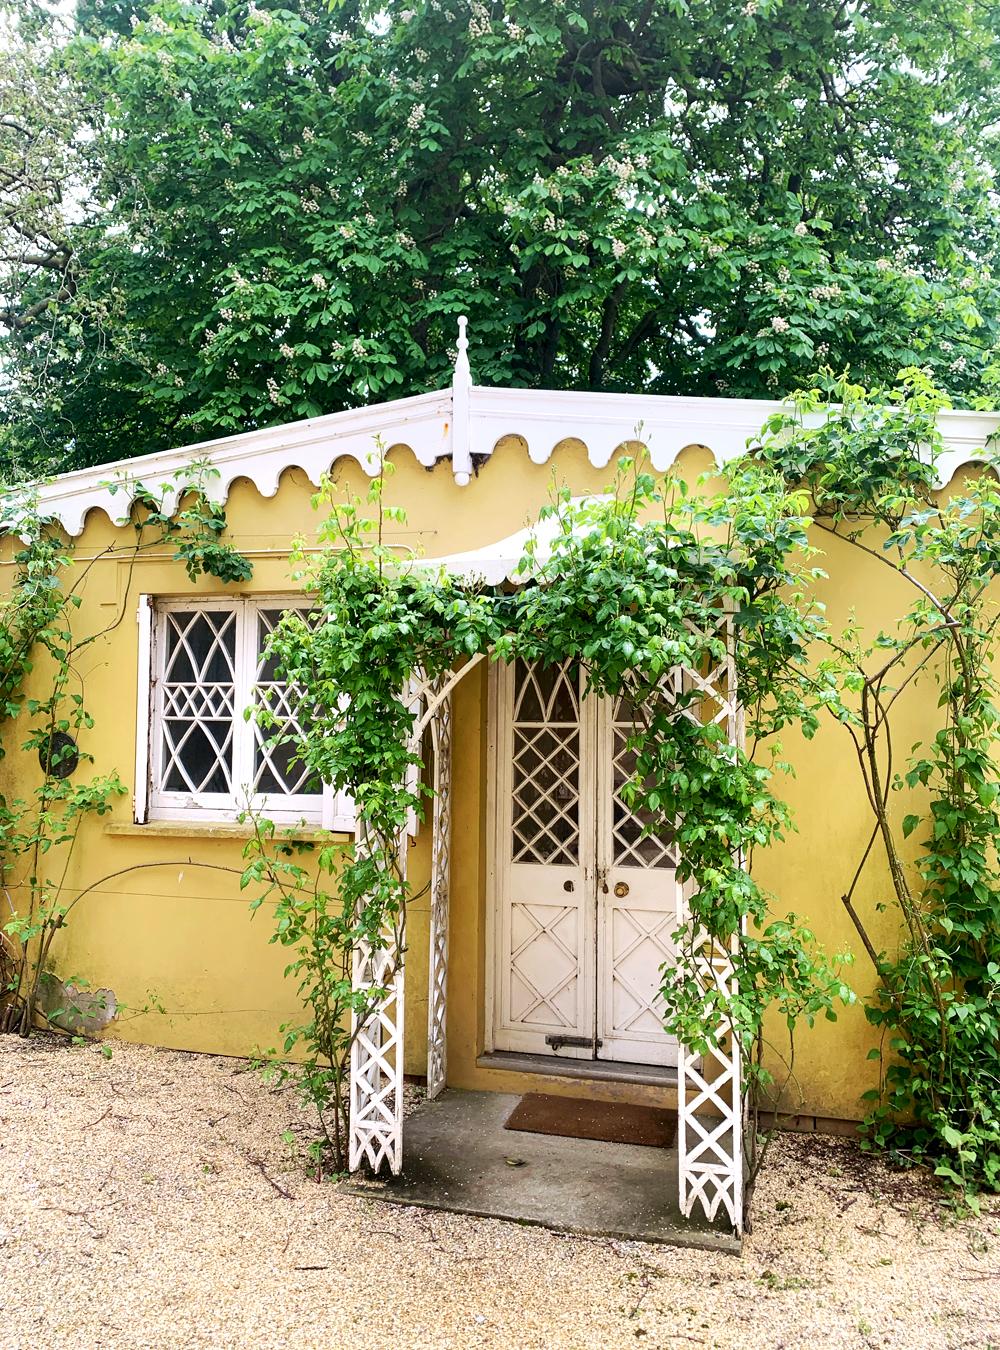 Sydney Gardens in Bath - Emma Louise Layla, UK travel & lifestyle blog